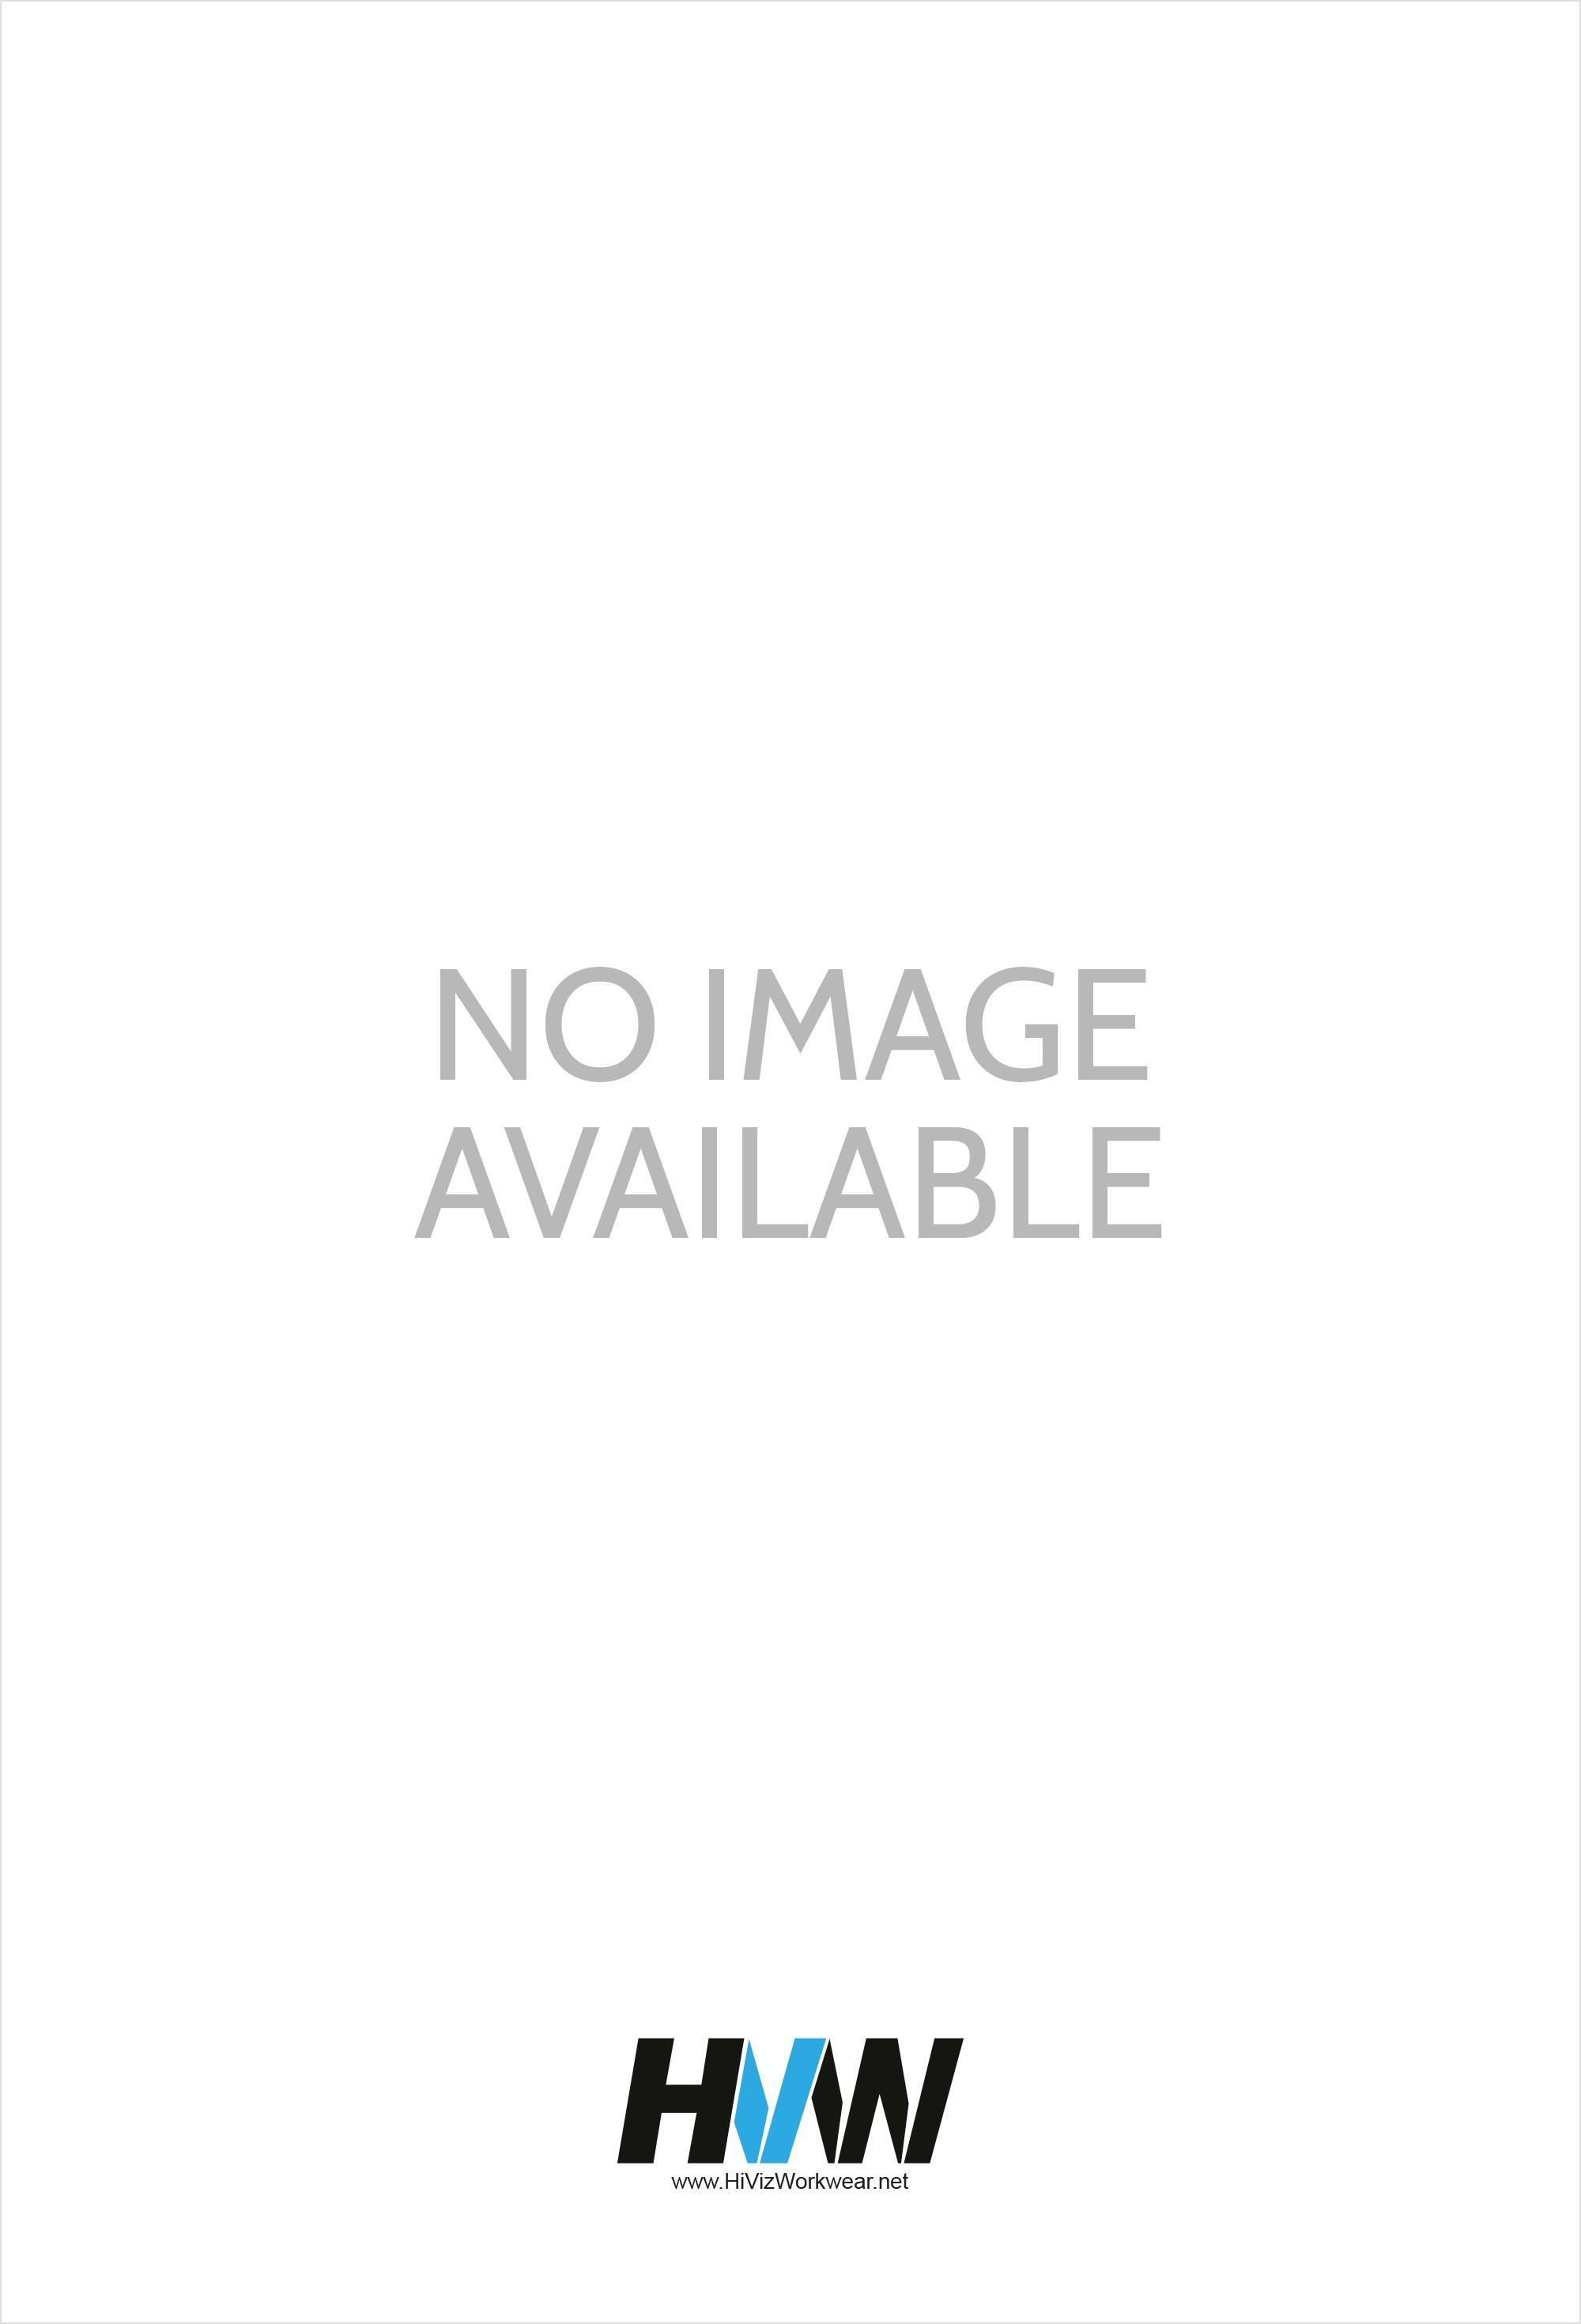 KK134 Pilot Shirt Long Sleeved  (COLLAR SIZE 14.5 tO 19.5)